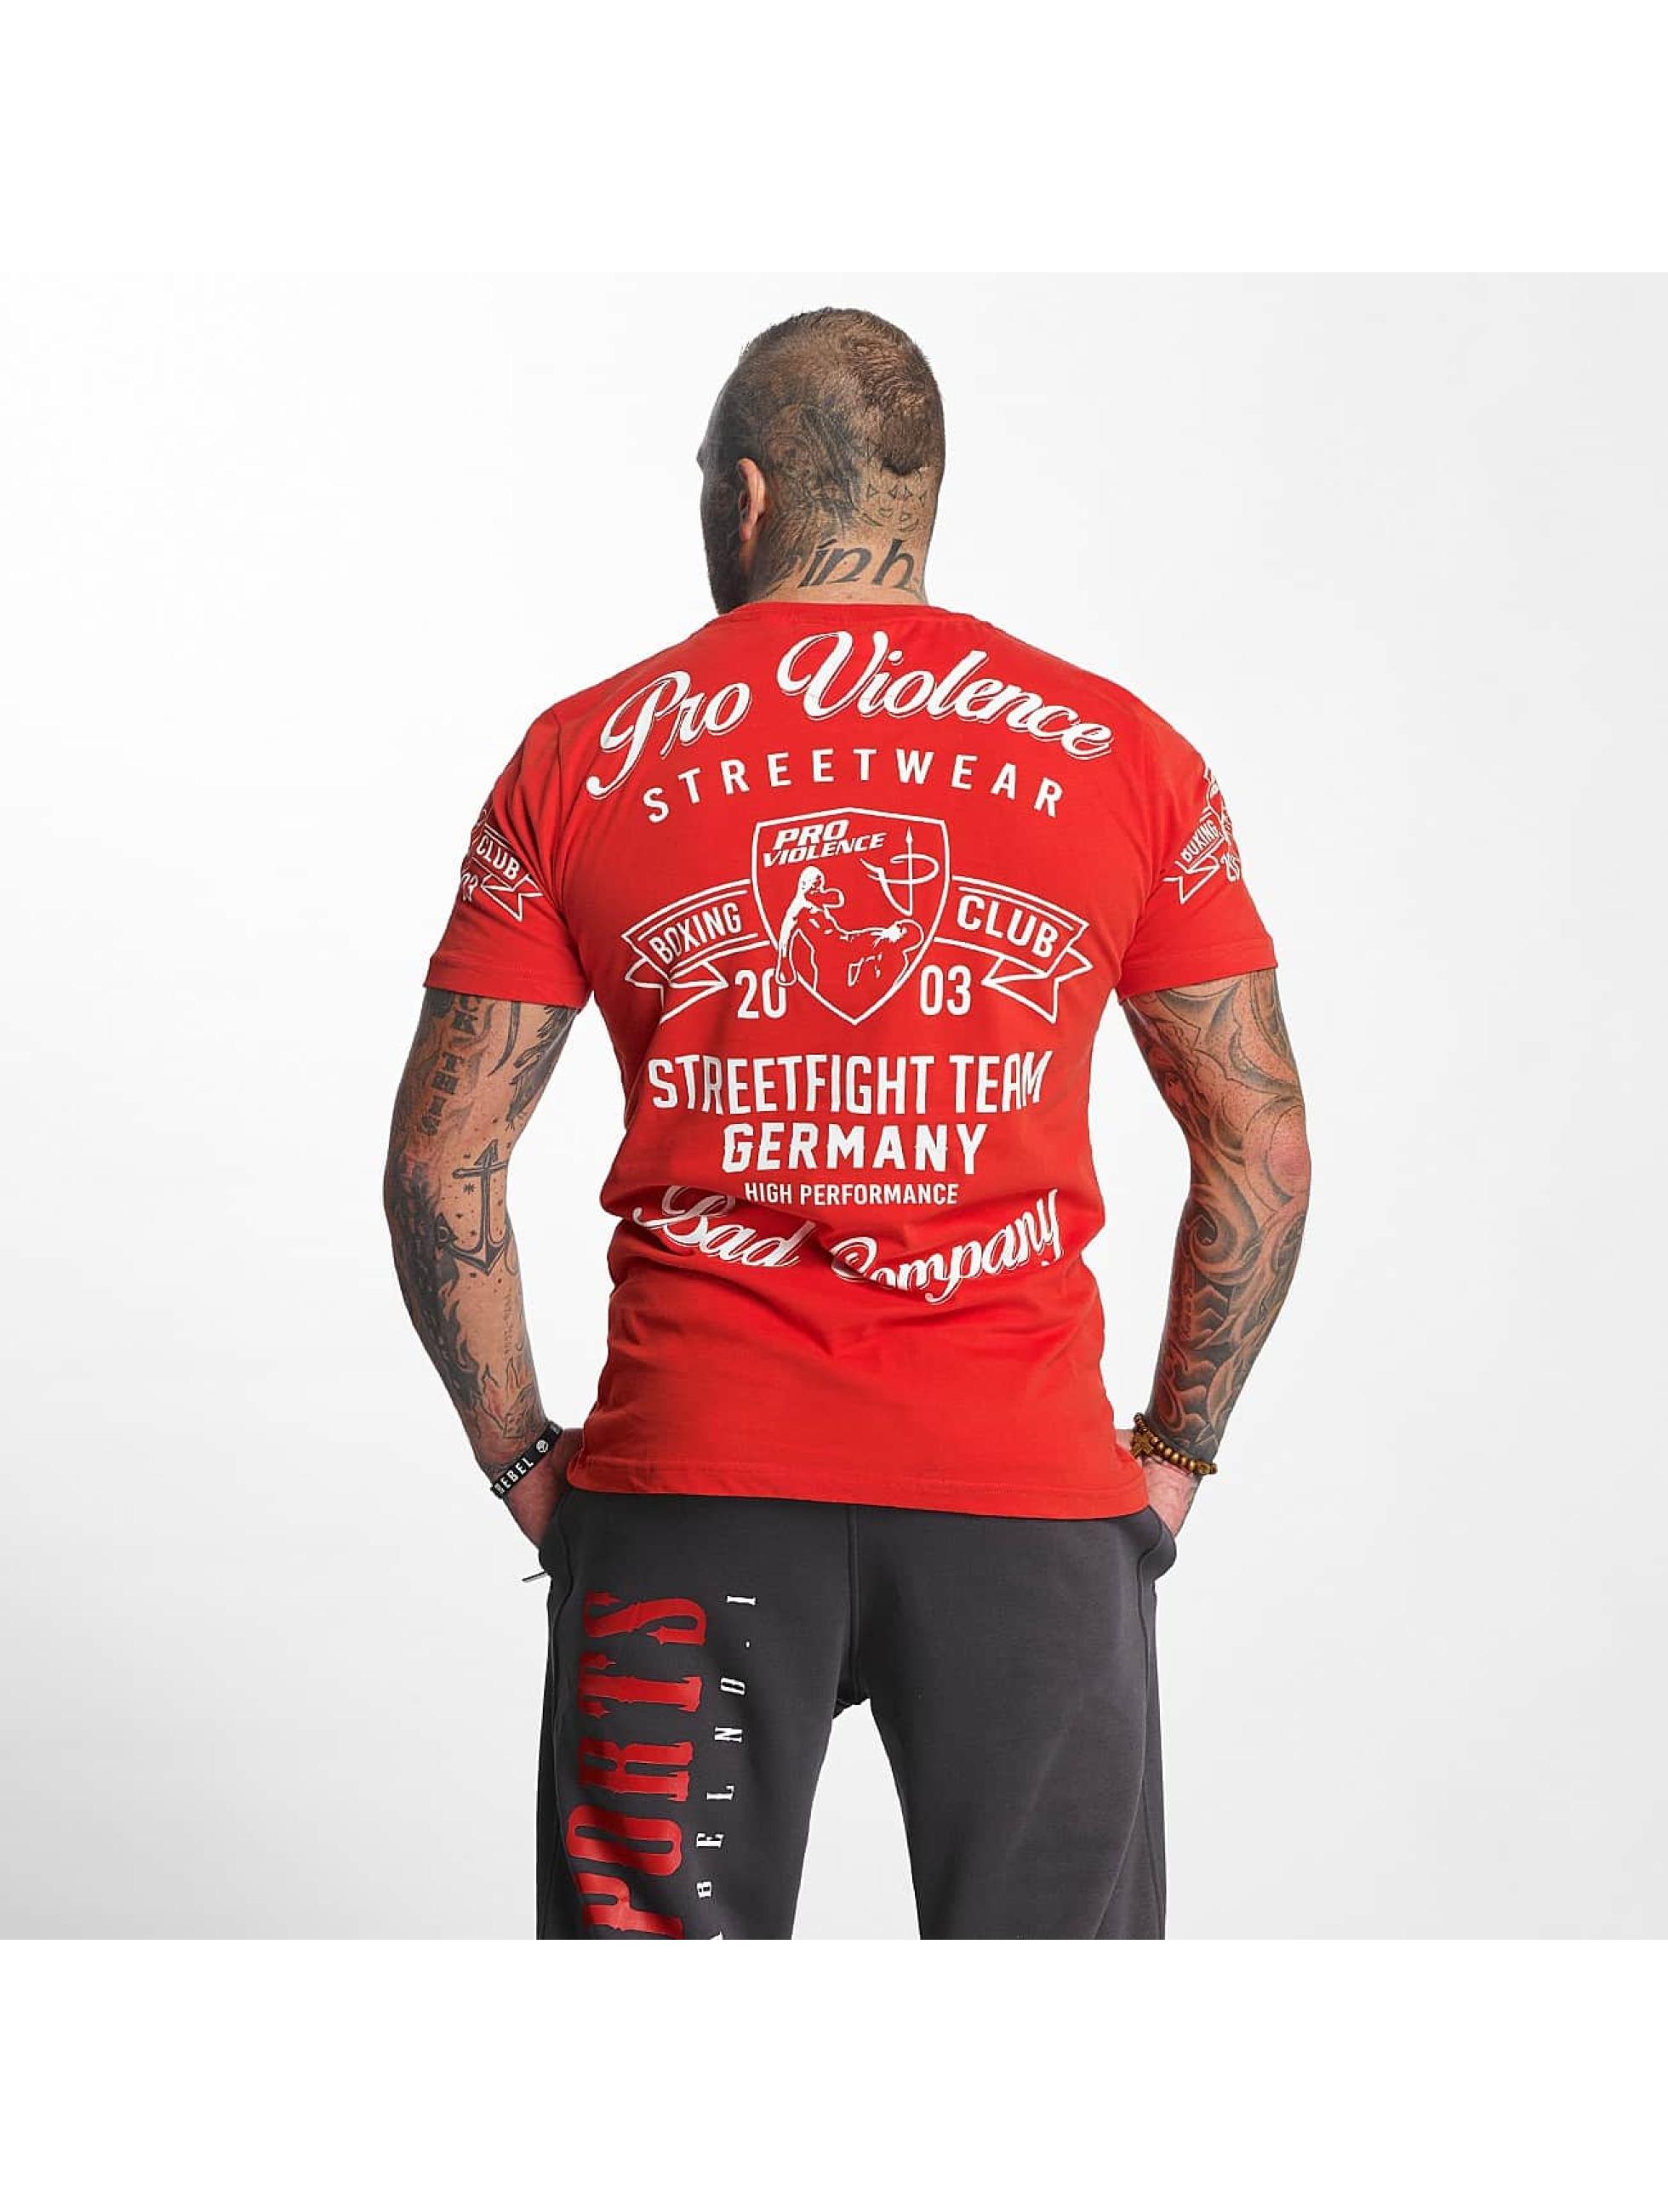 Pro Violence Streetwear T-paidat Streetwear Boxing Club punainen